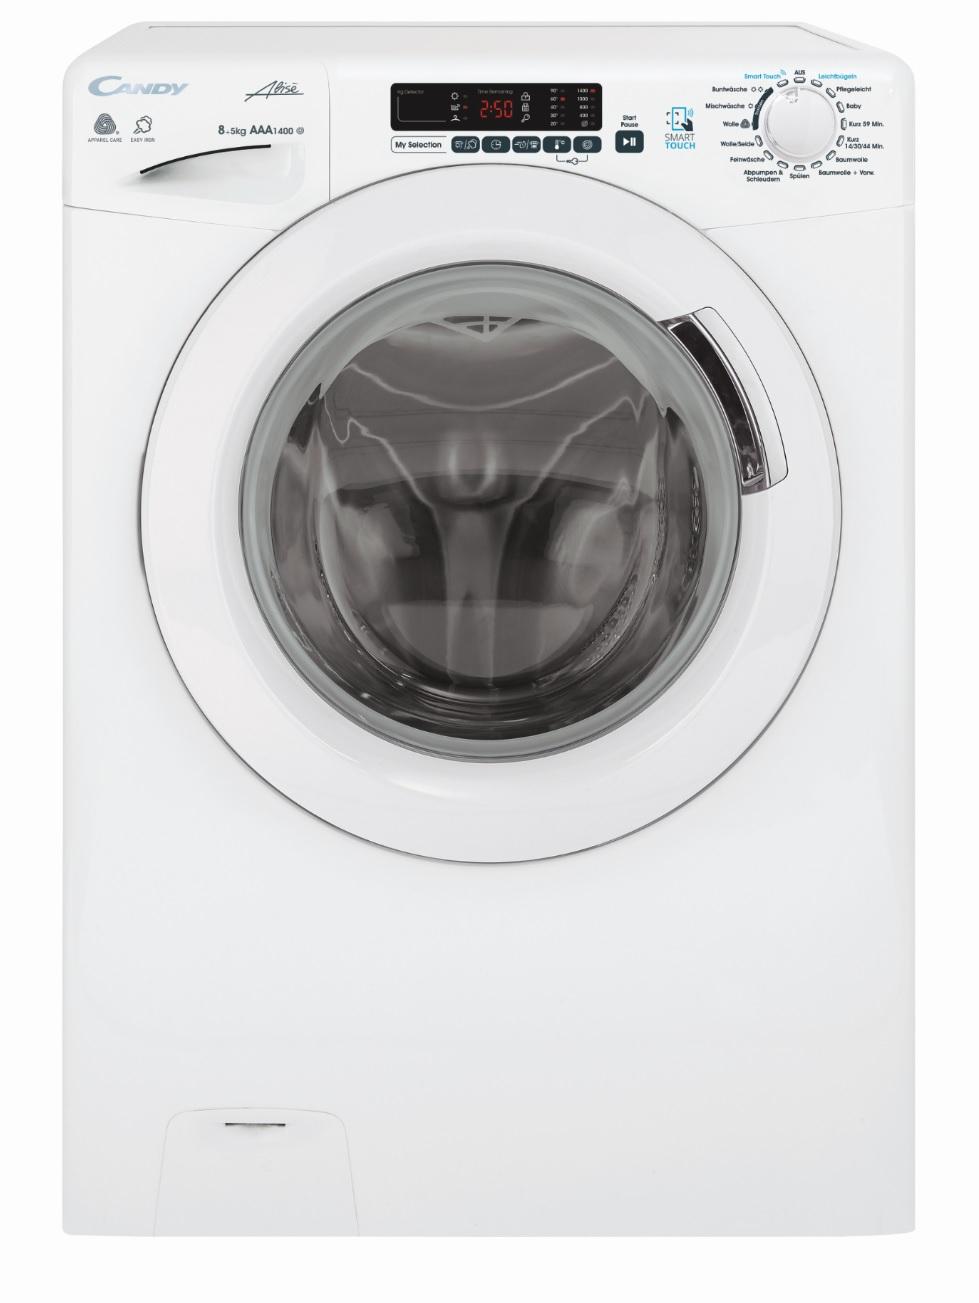 waschtrockner eek a waschen u trocknen 2in1 waschmaschine 8 kg trockner 5 kg ebay. Black Bedroom Furniture Sets. Home Design Ideas